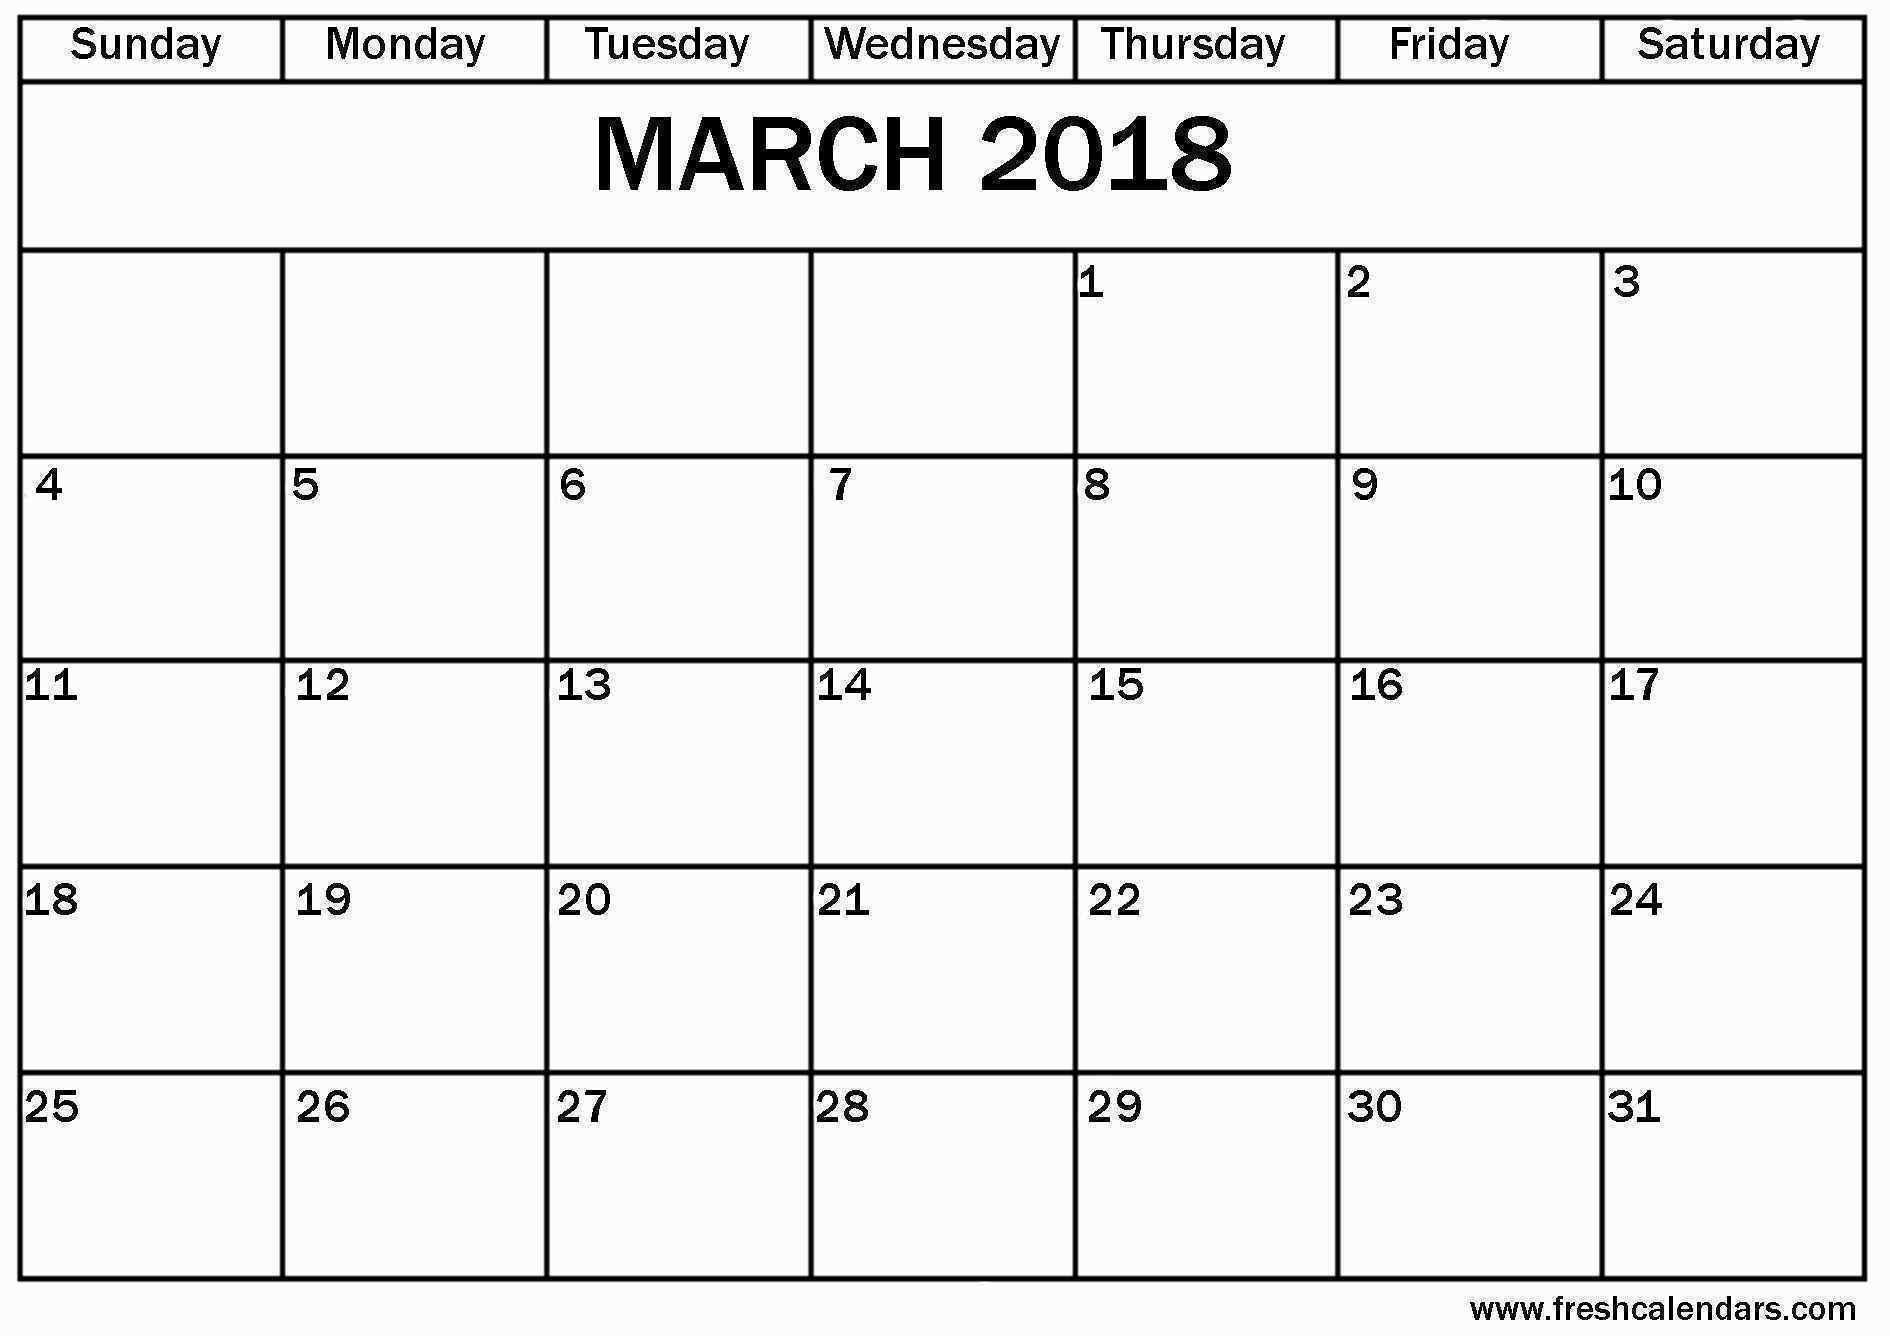 Kalender Selbst Ausdrucken Happy Birthday Karte Zum Ausdrucken Einzigartig Birthday Karte 0d – Wantedforwarcrimes